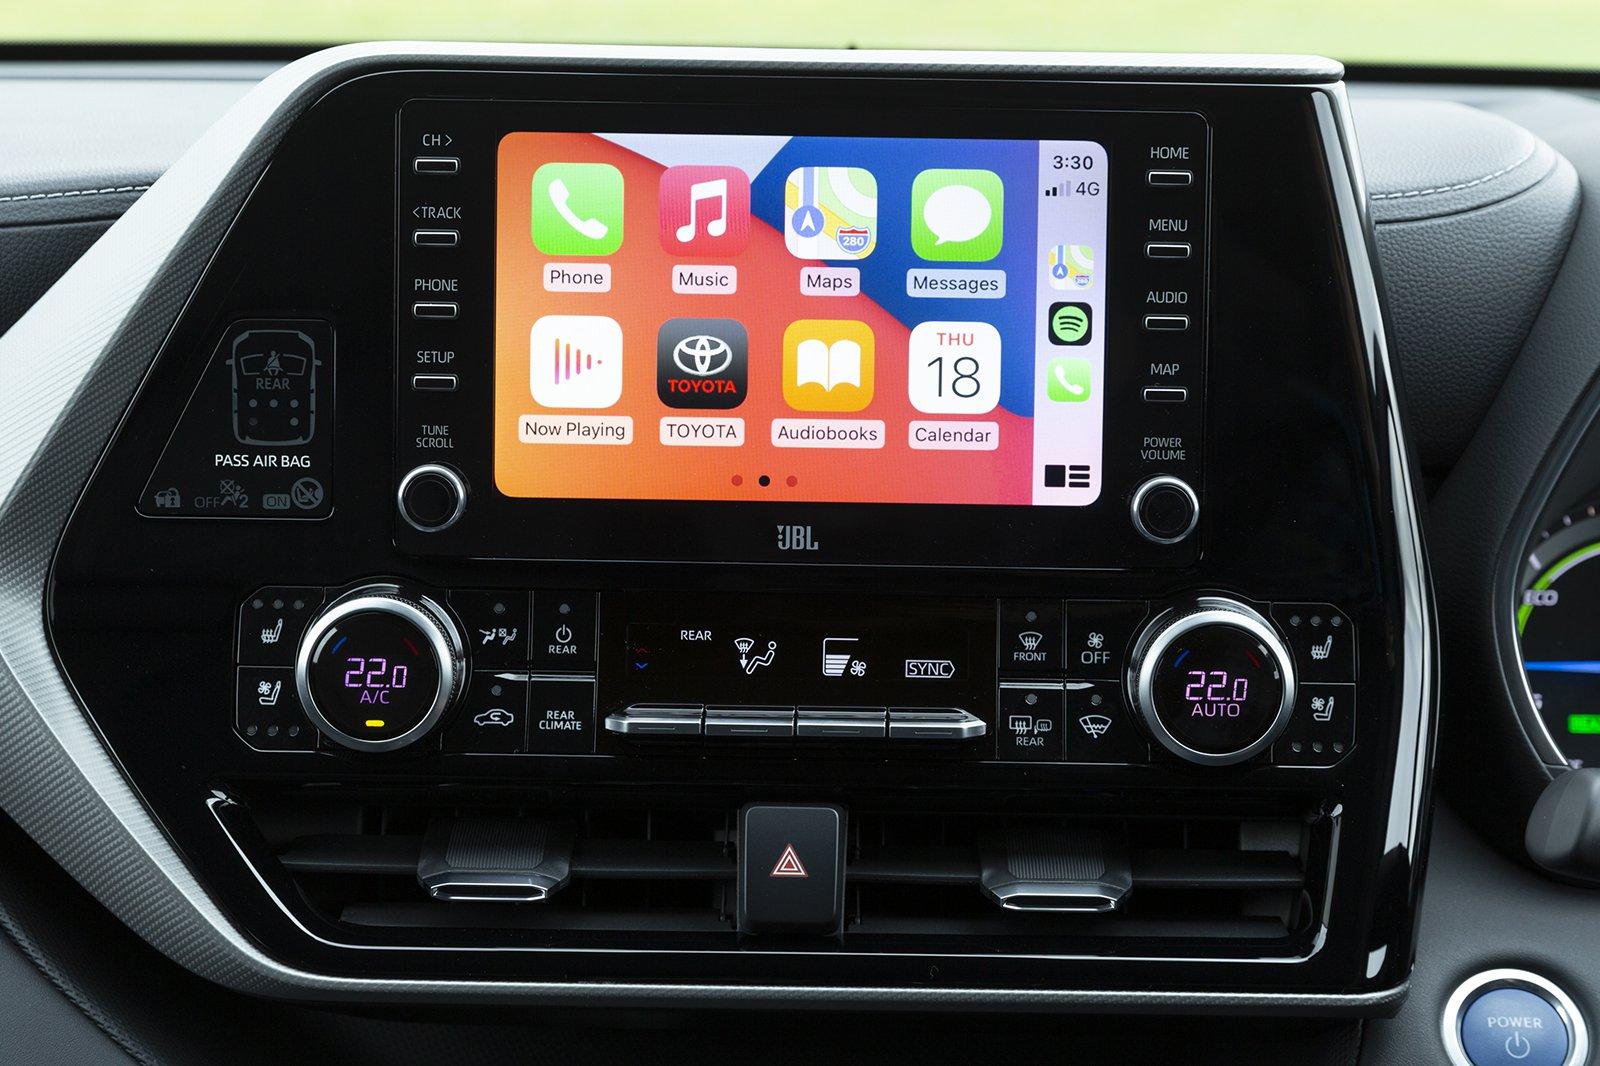 Toyota Highlander 2021 infotainment